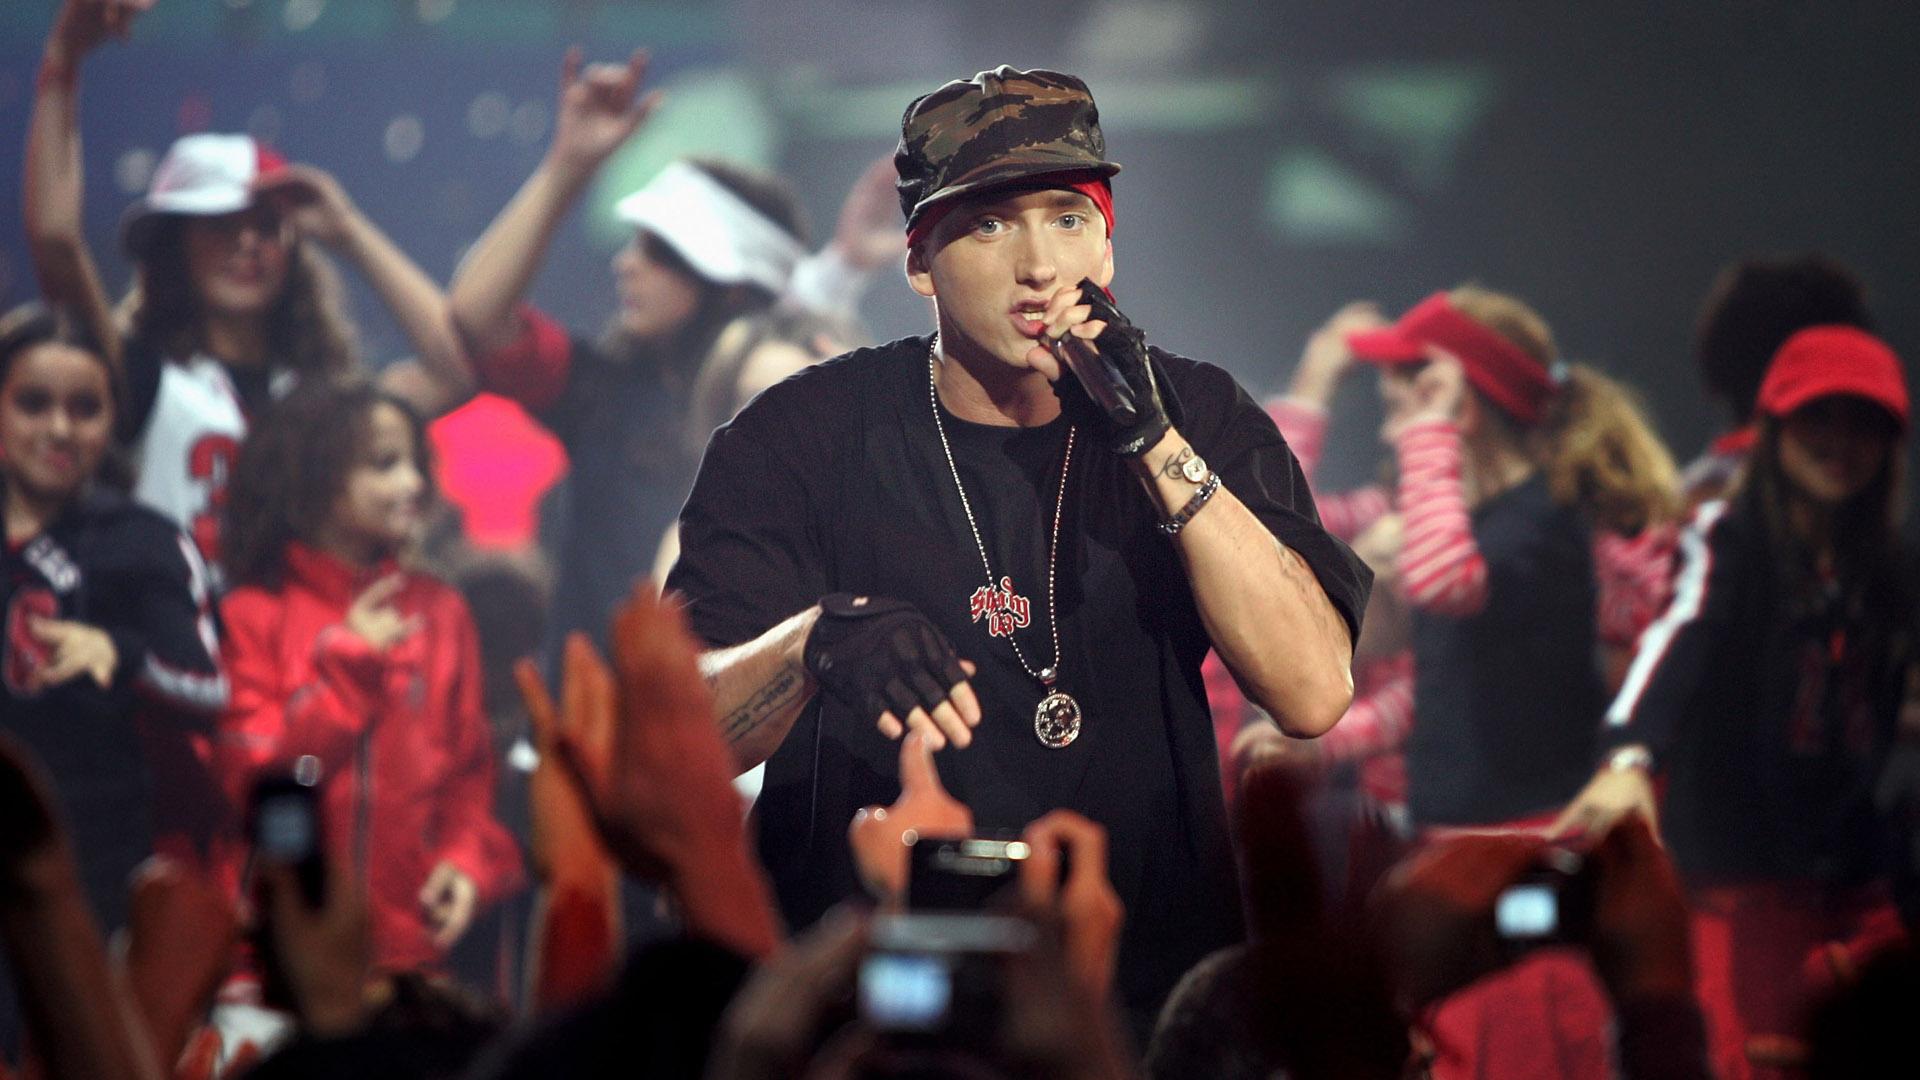 Fall Out Boy Desktop Wallpaper Hd Eminem Singer Wallpaper Pixelstalk Net